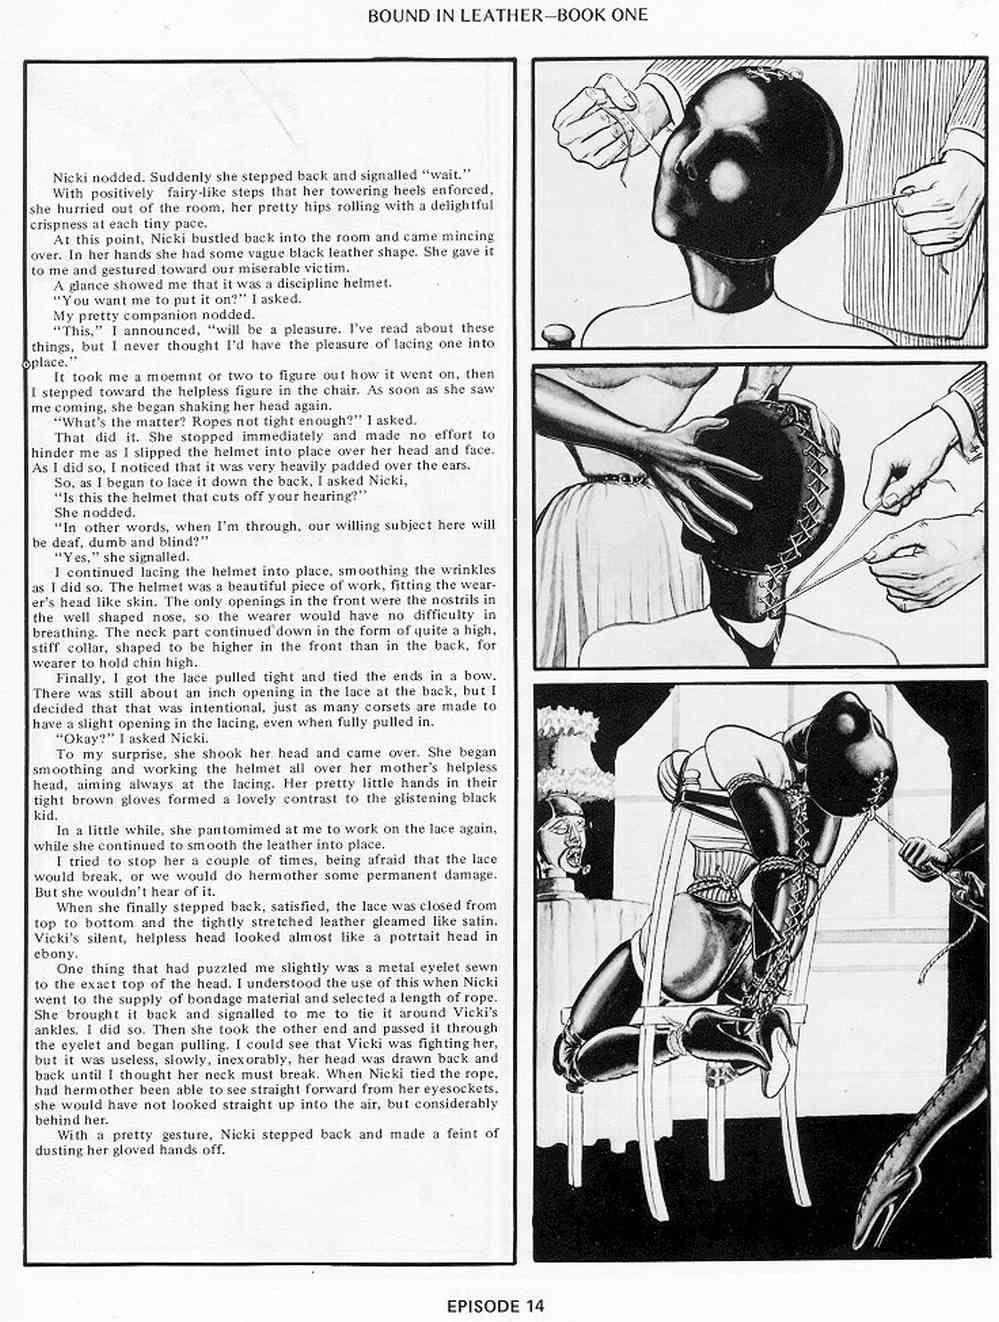 bondage comics Stanton